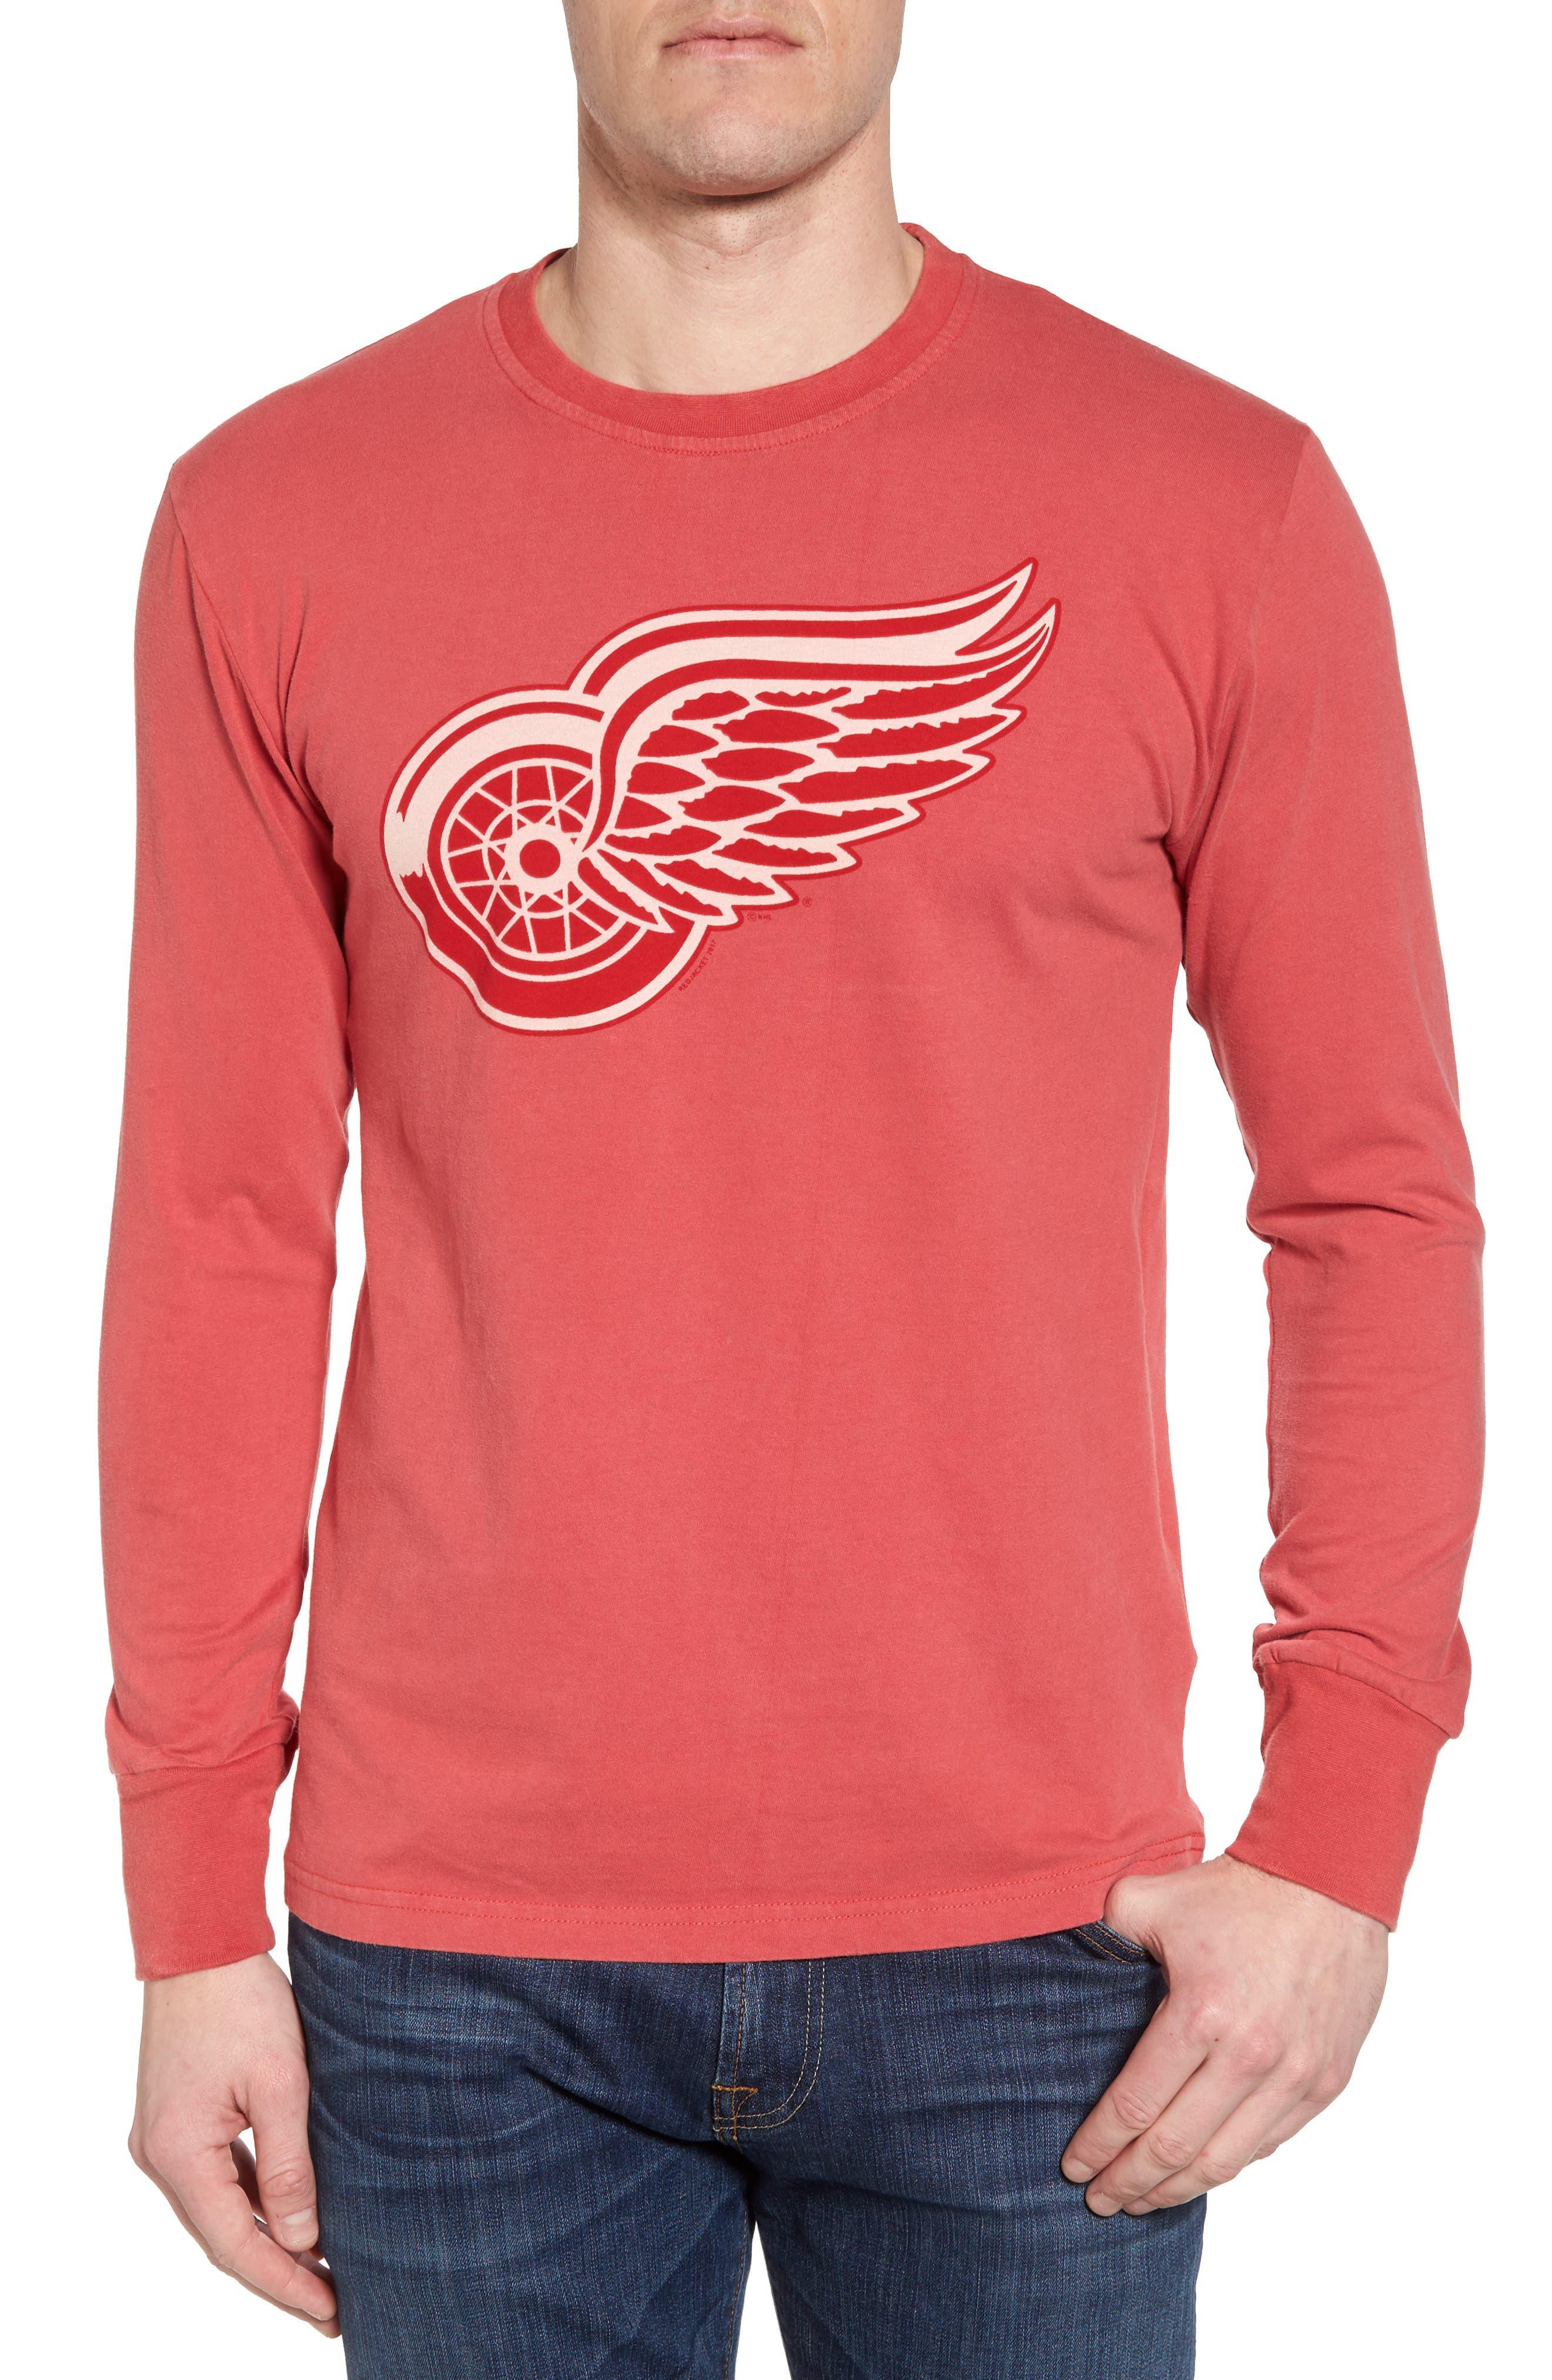 Gresham Red Wings T-Shirt,                             Main thumbnail 1, color,                             Red